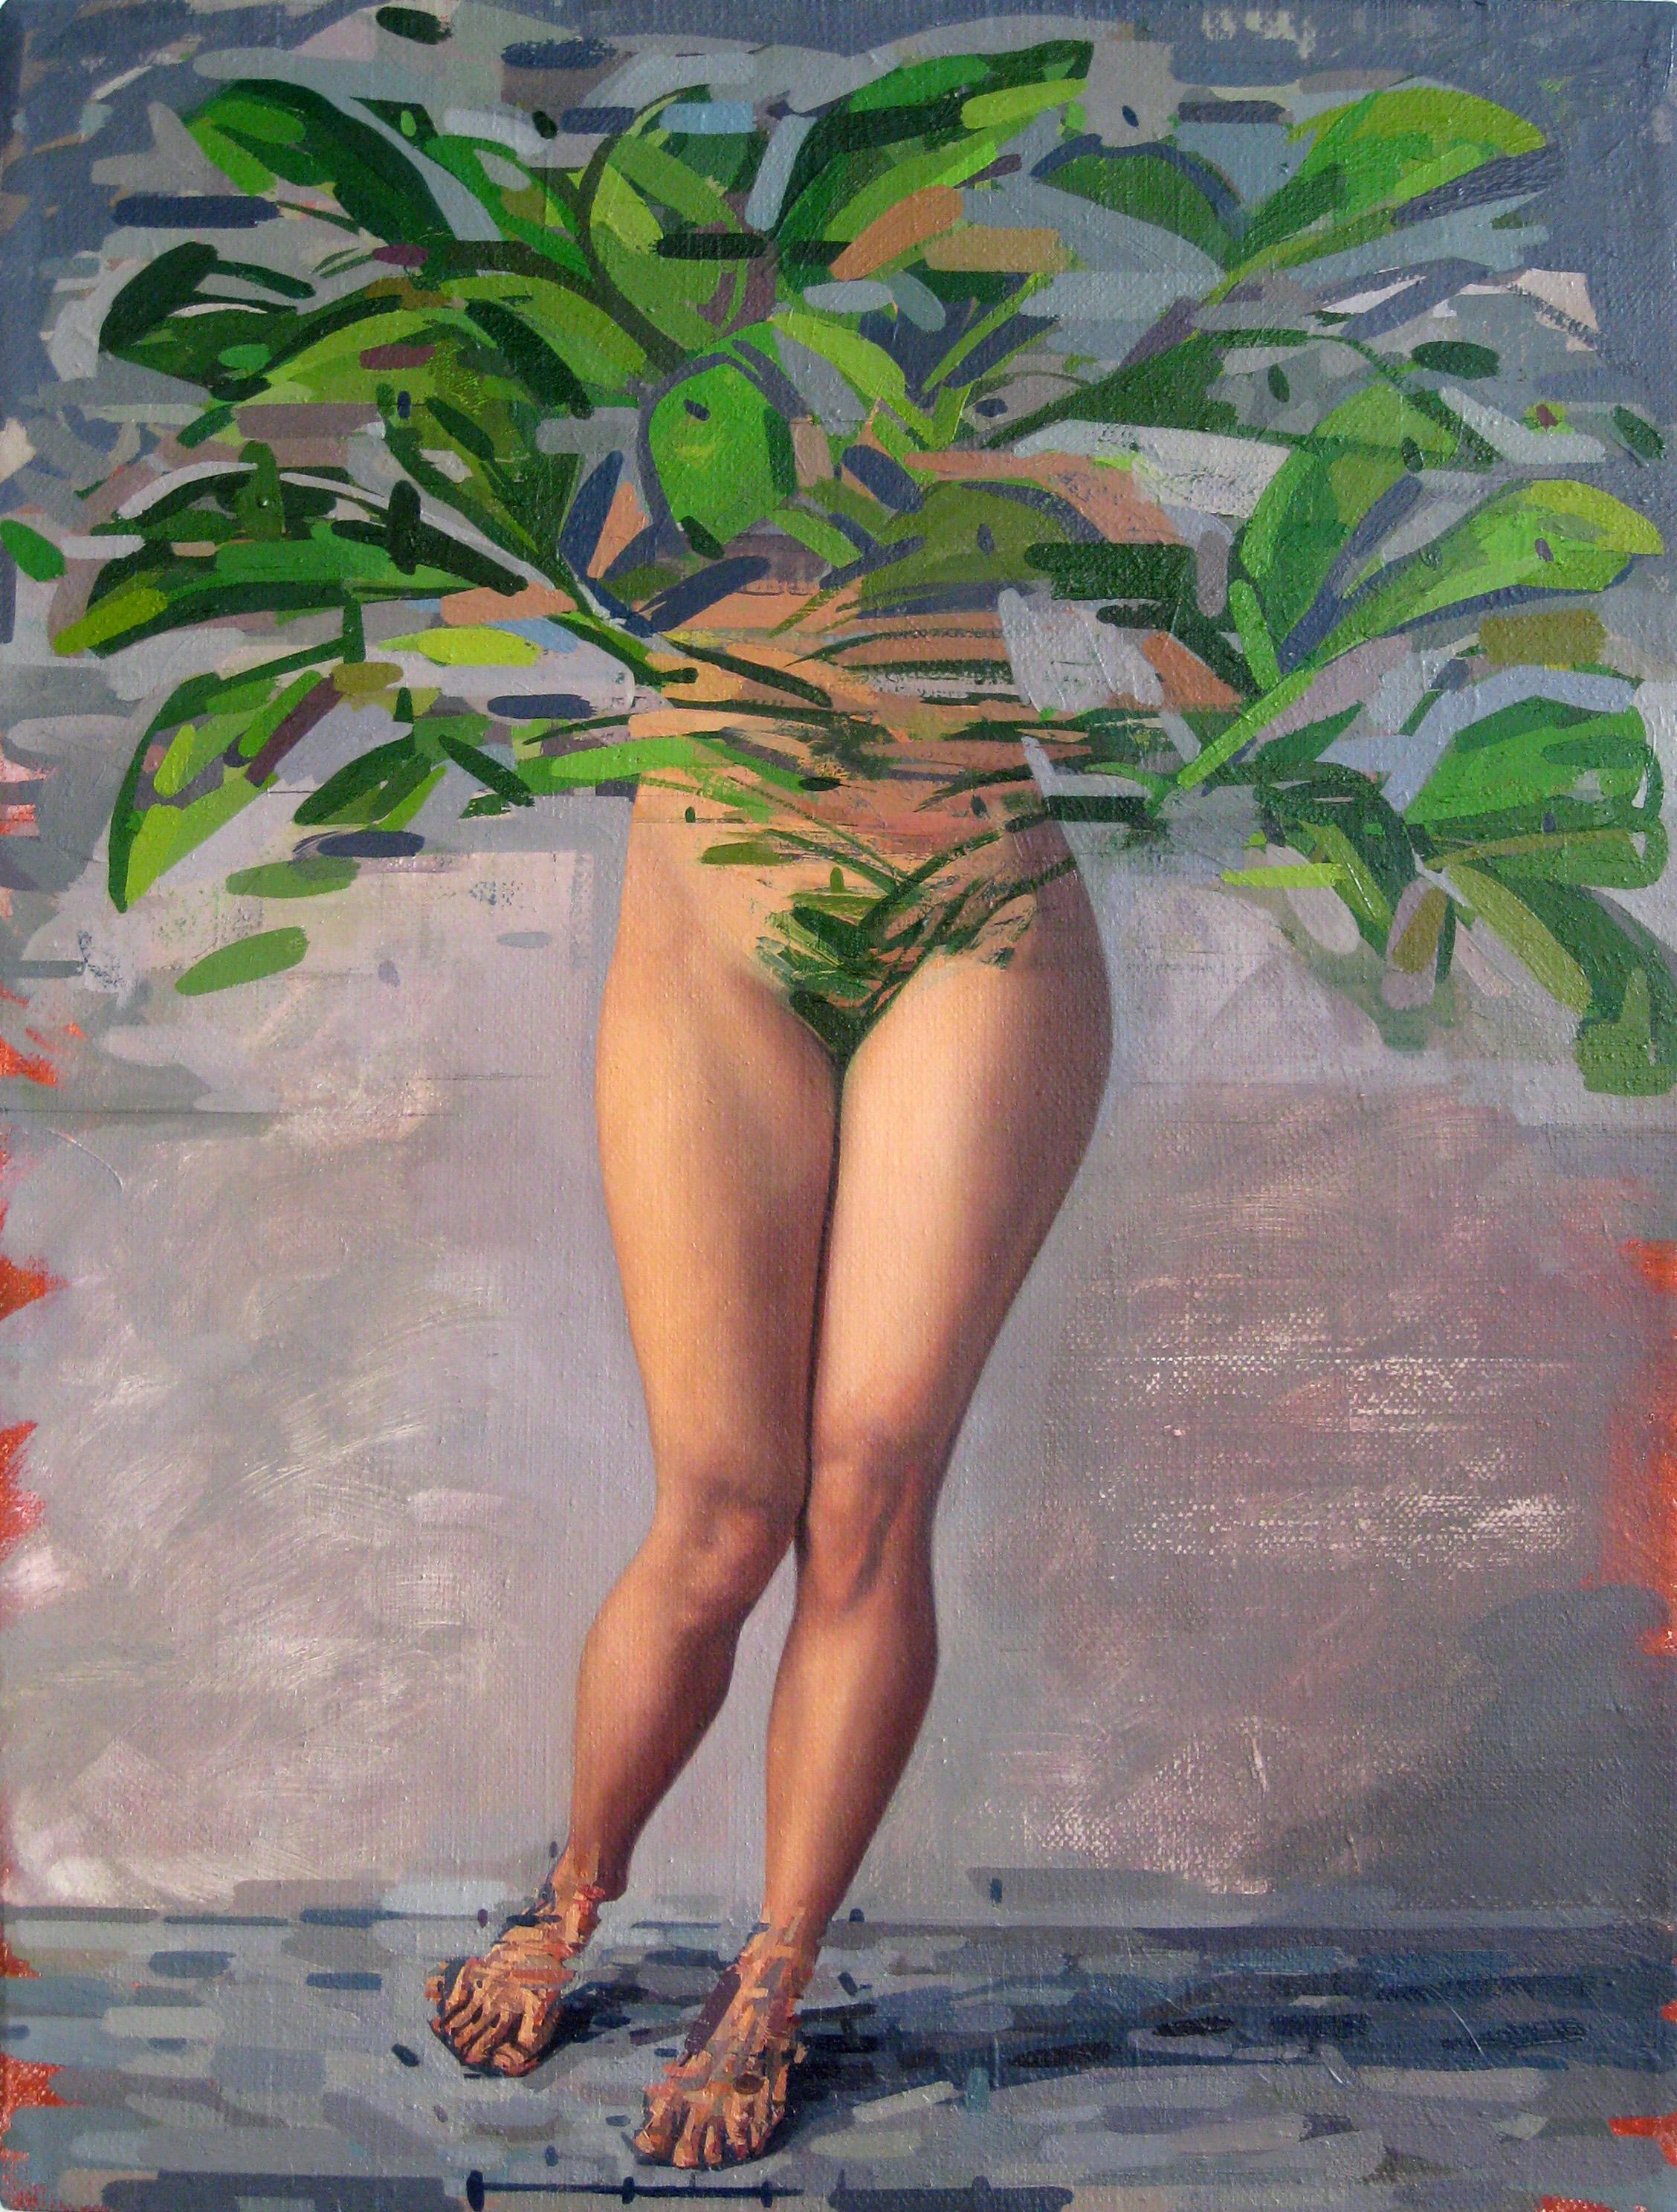 girl-tree-legs-131